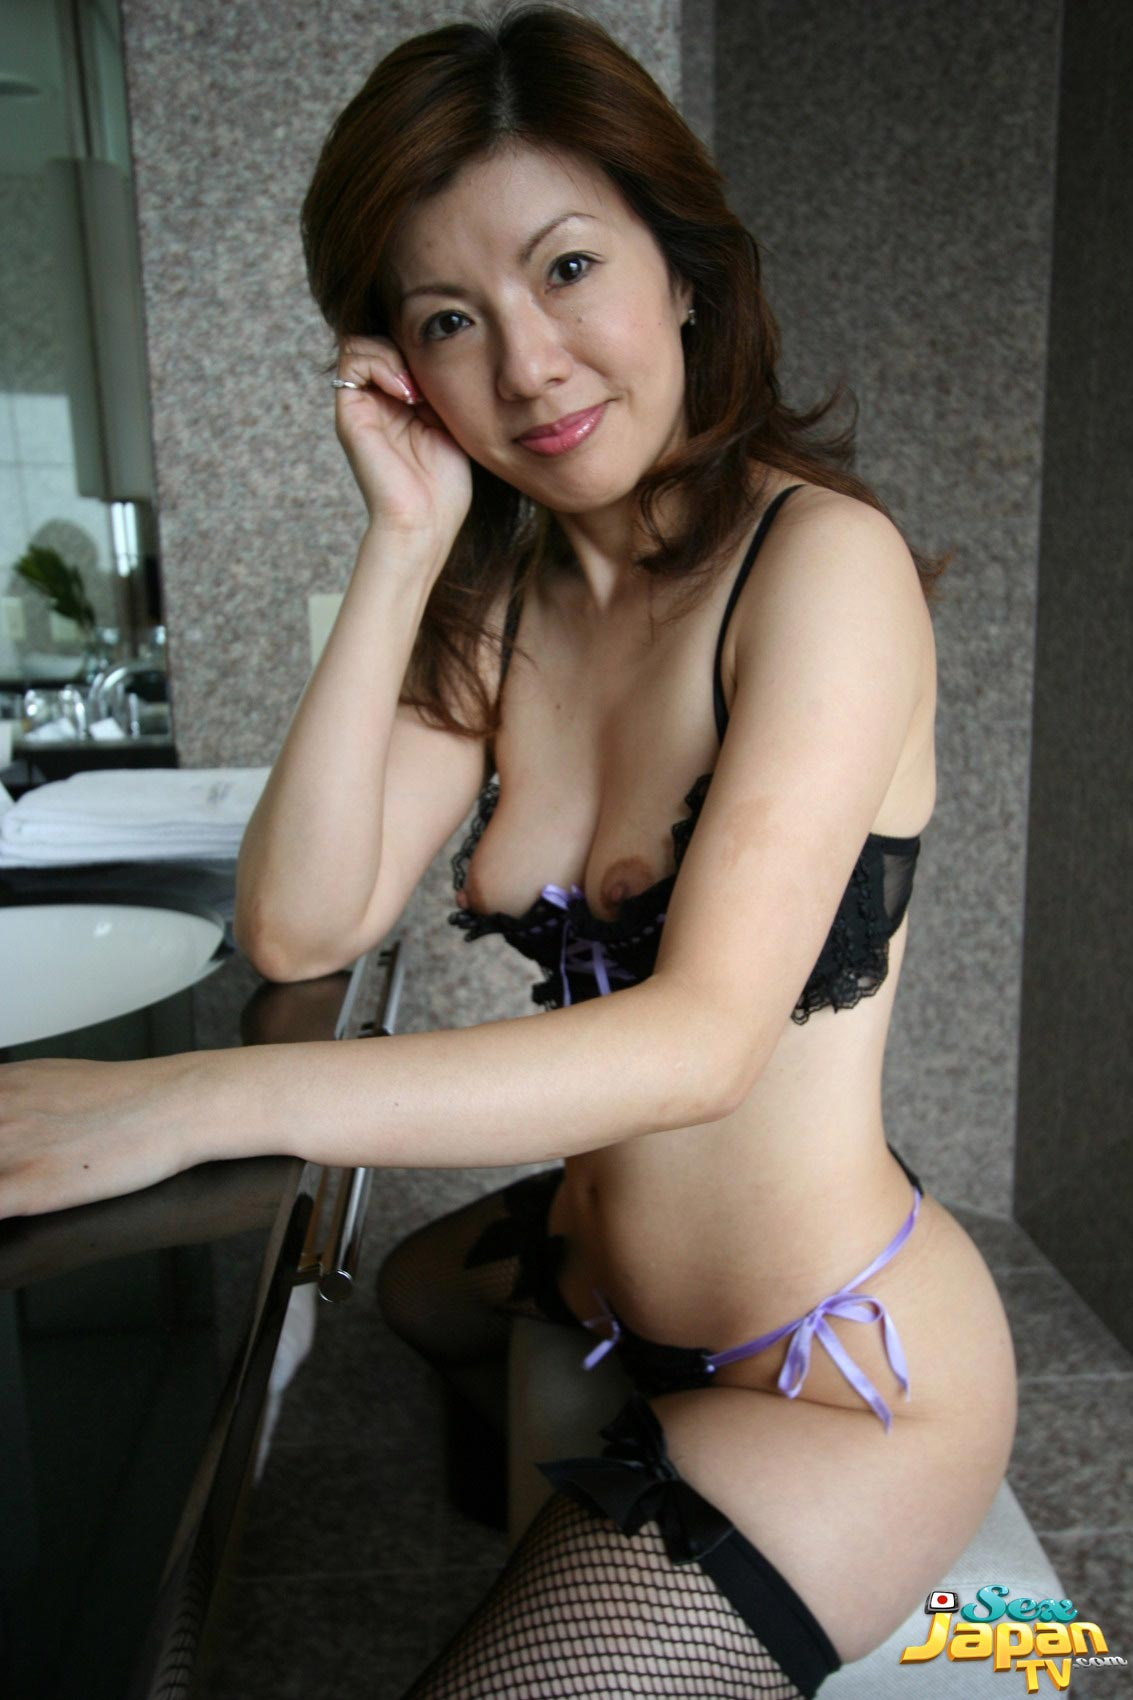 japan panty nude Milf